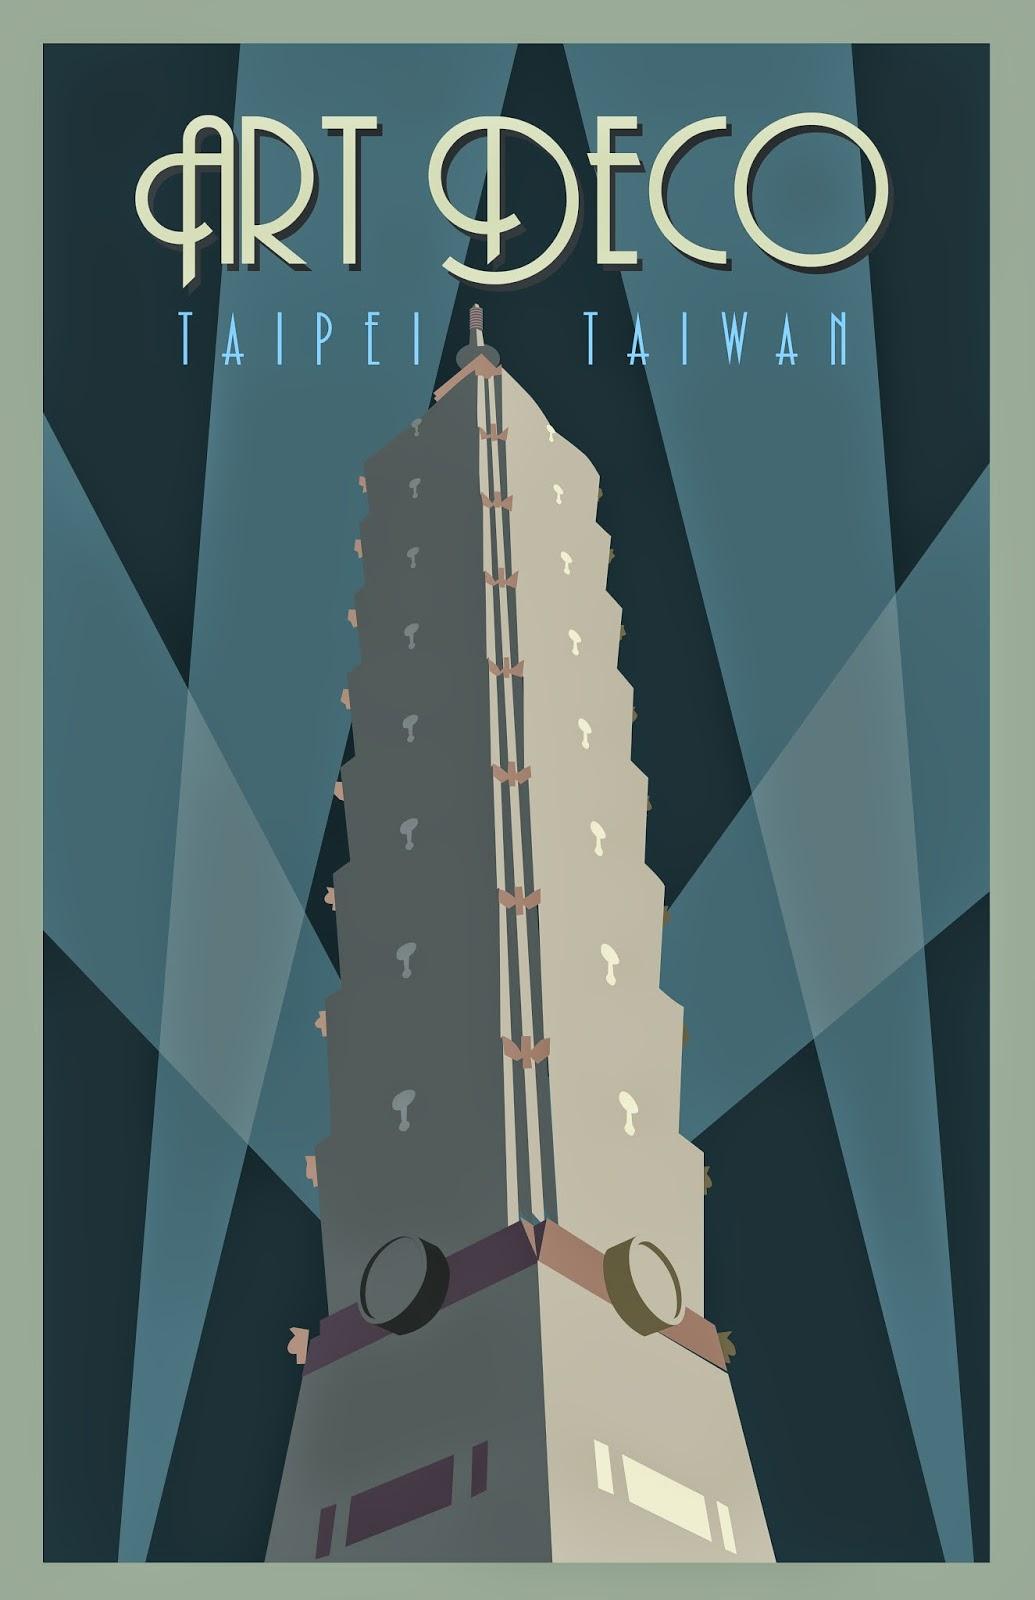 Vintage Art Deco Poster 60